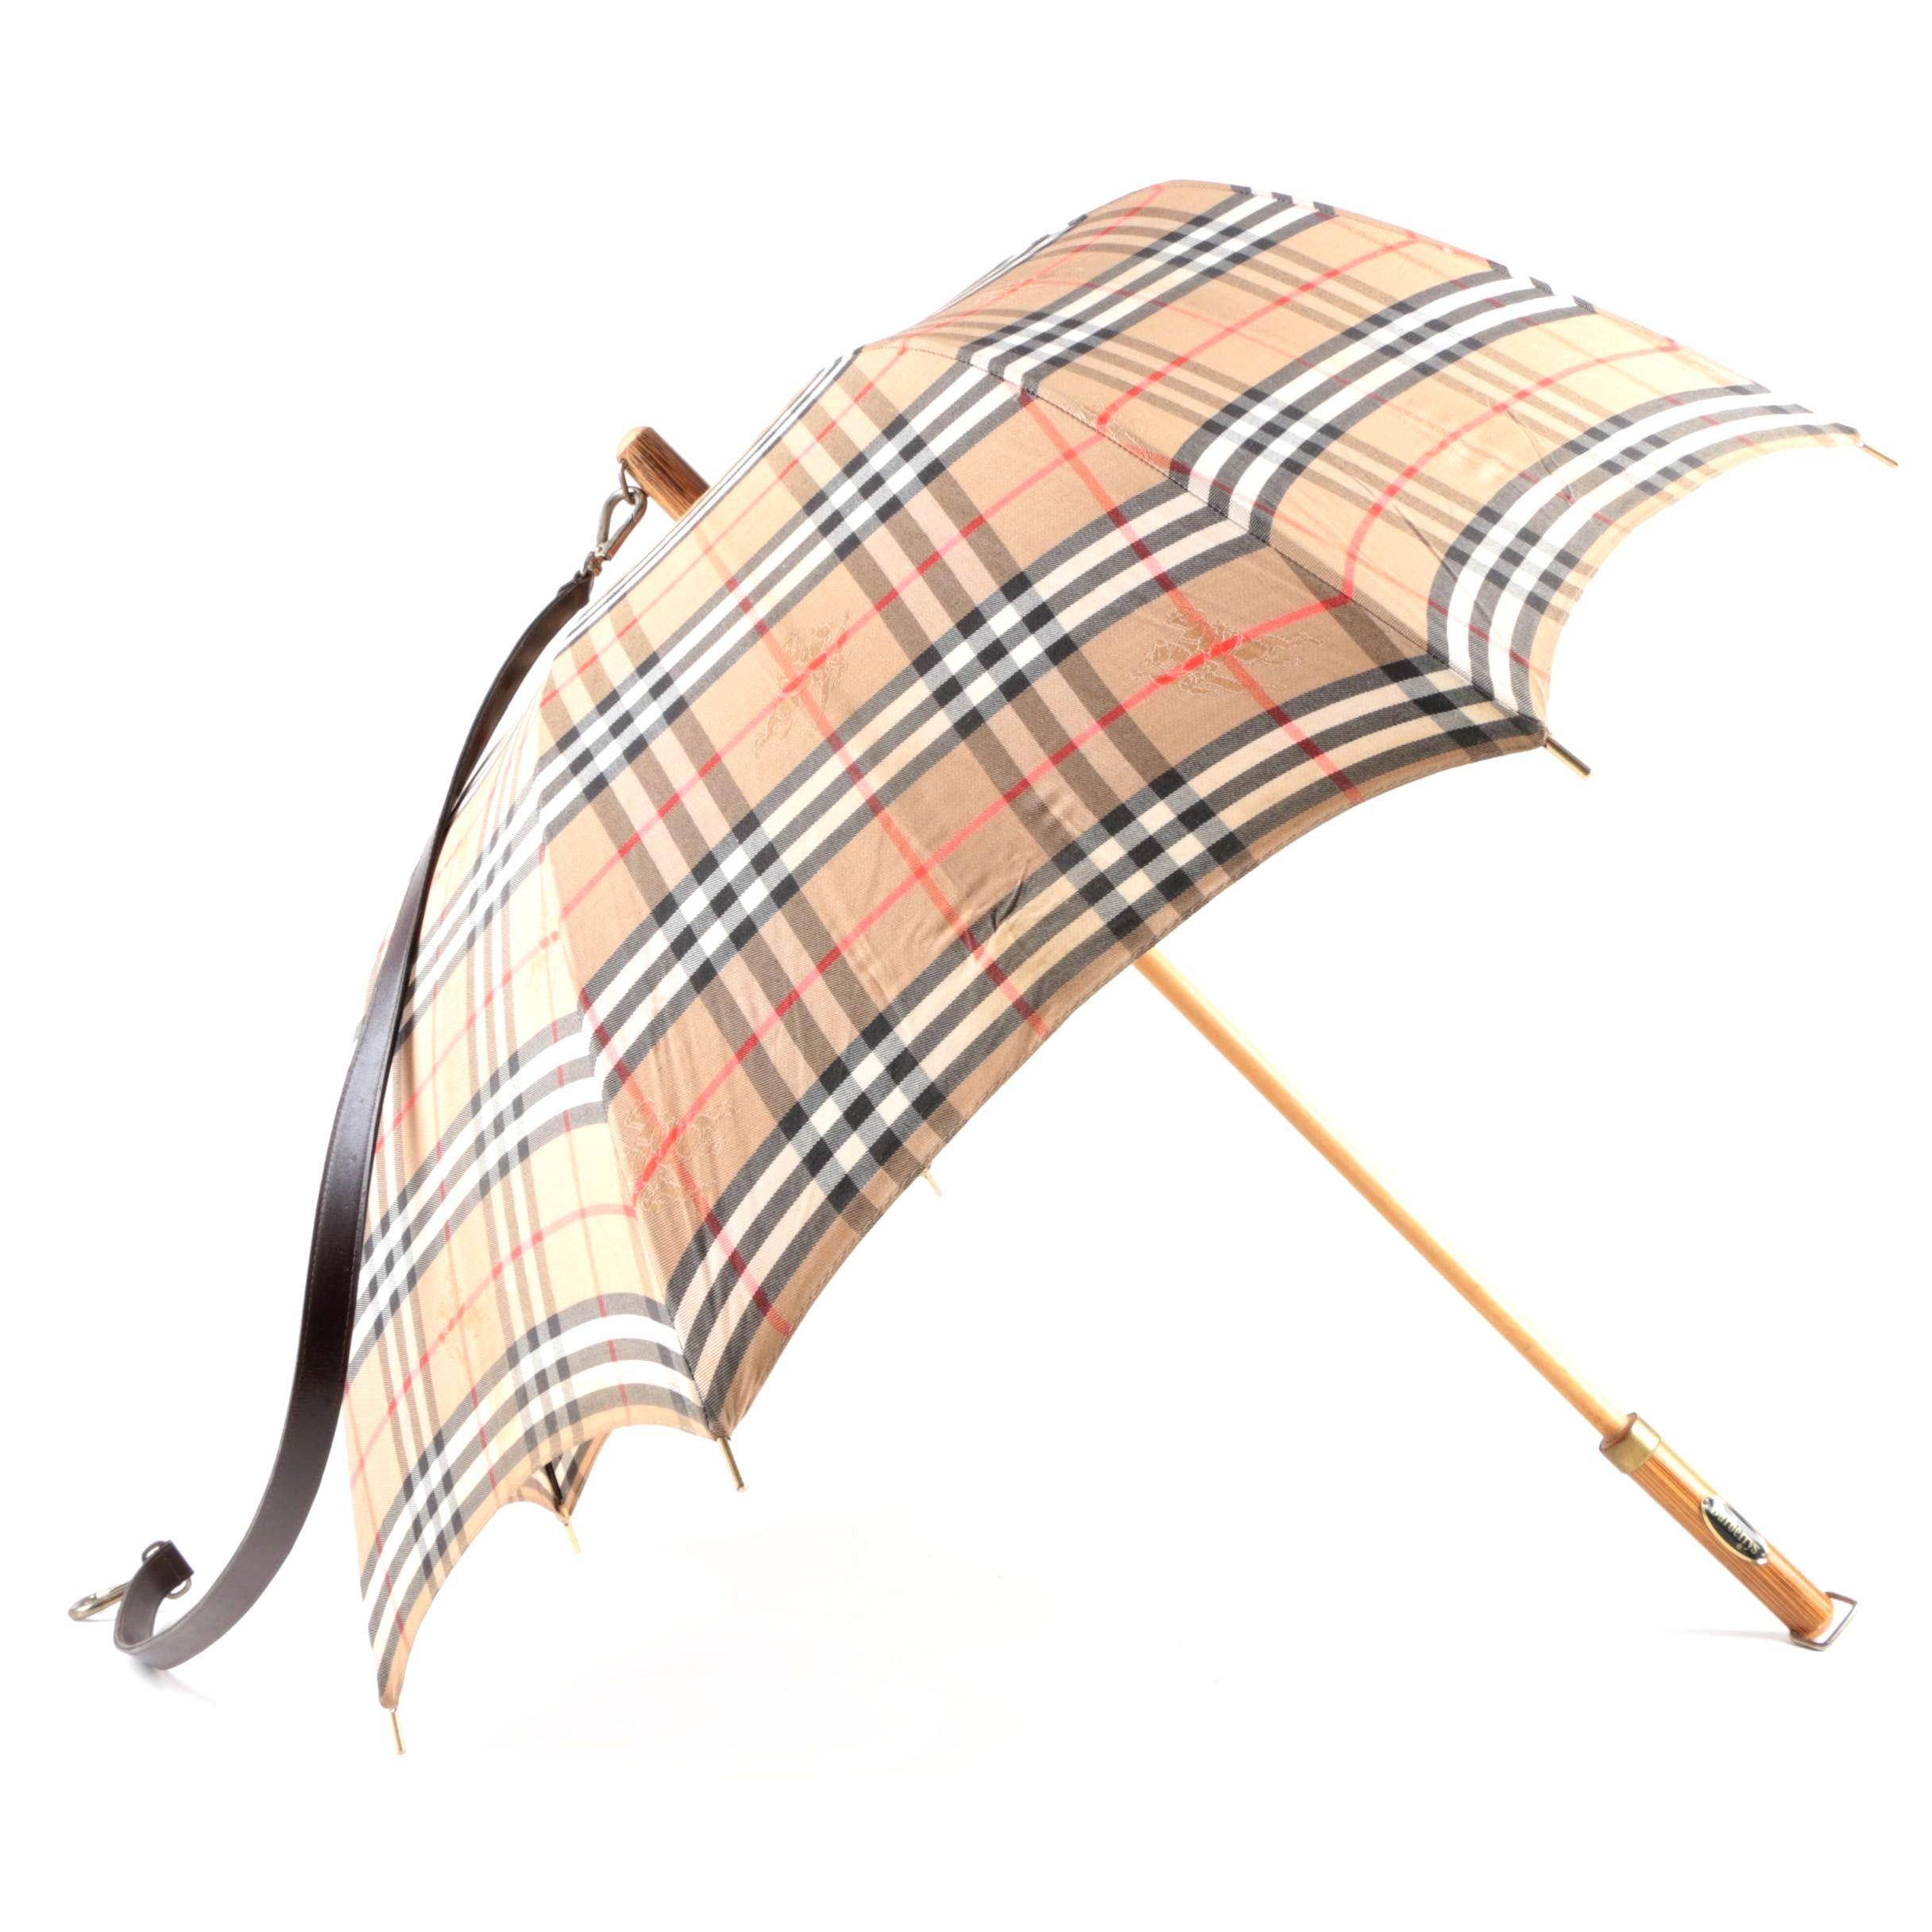 Burberrys Plaid Fabric and Leather Umbrella